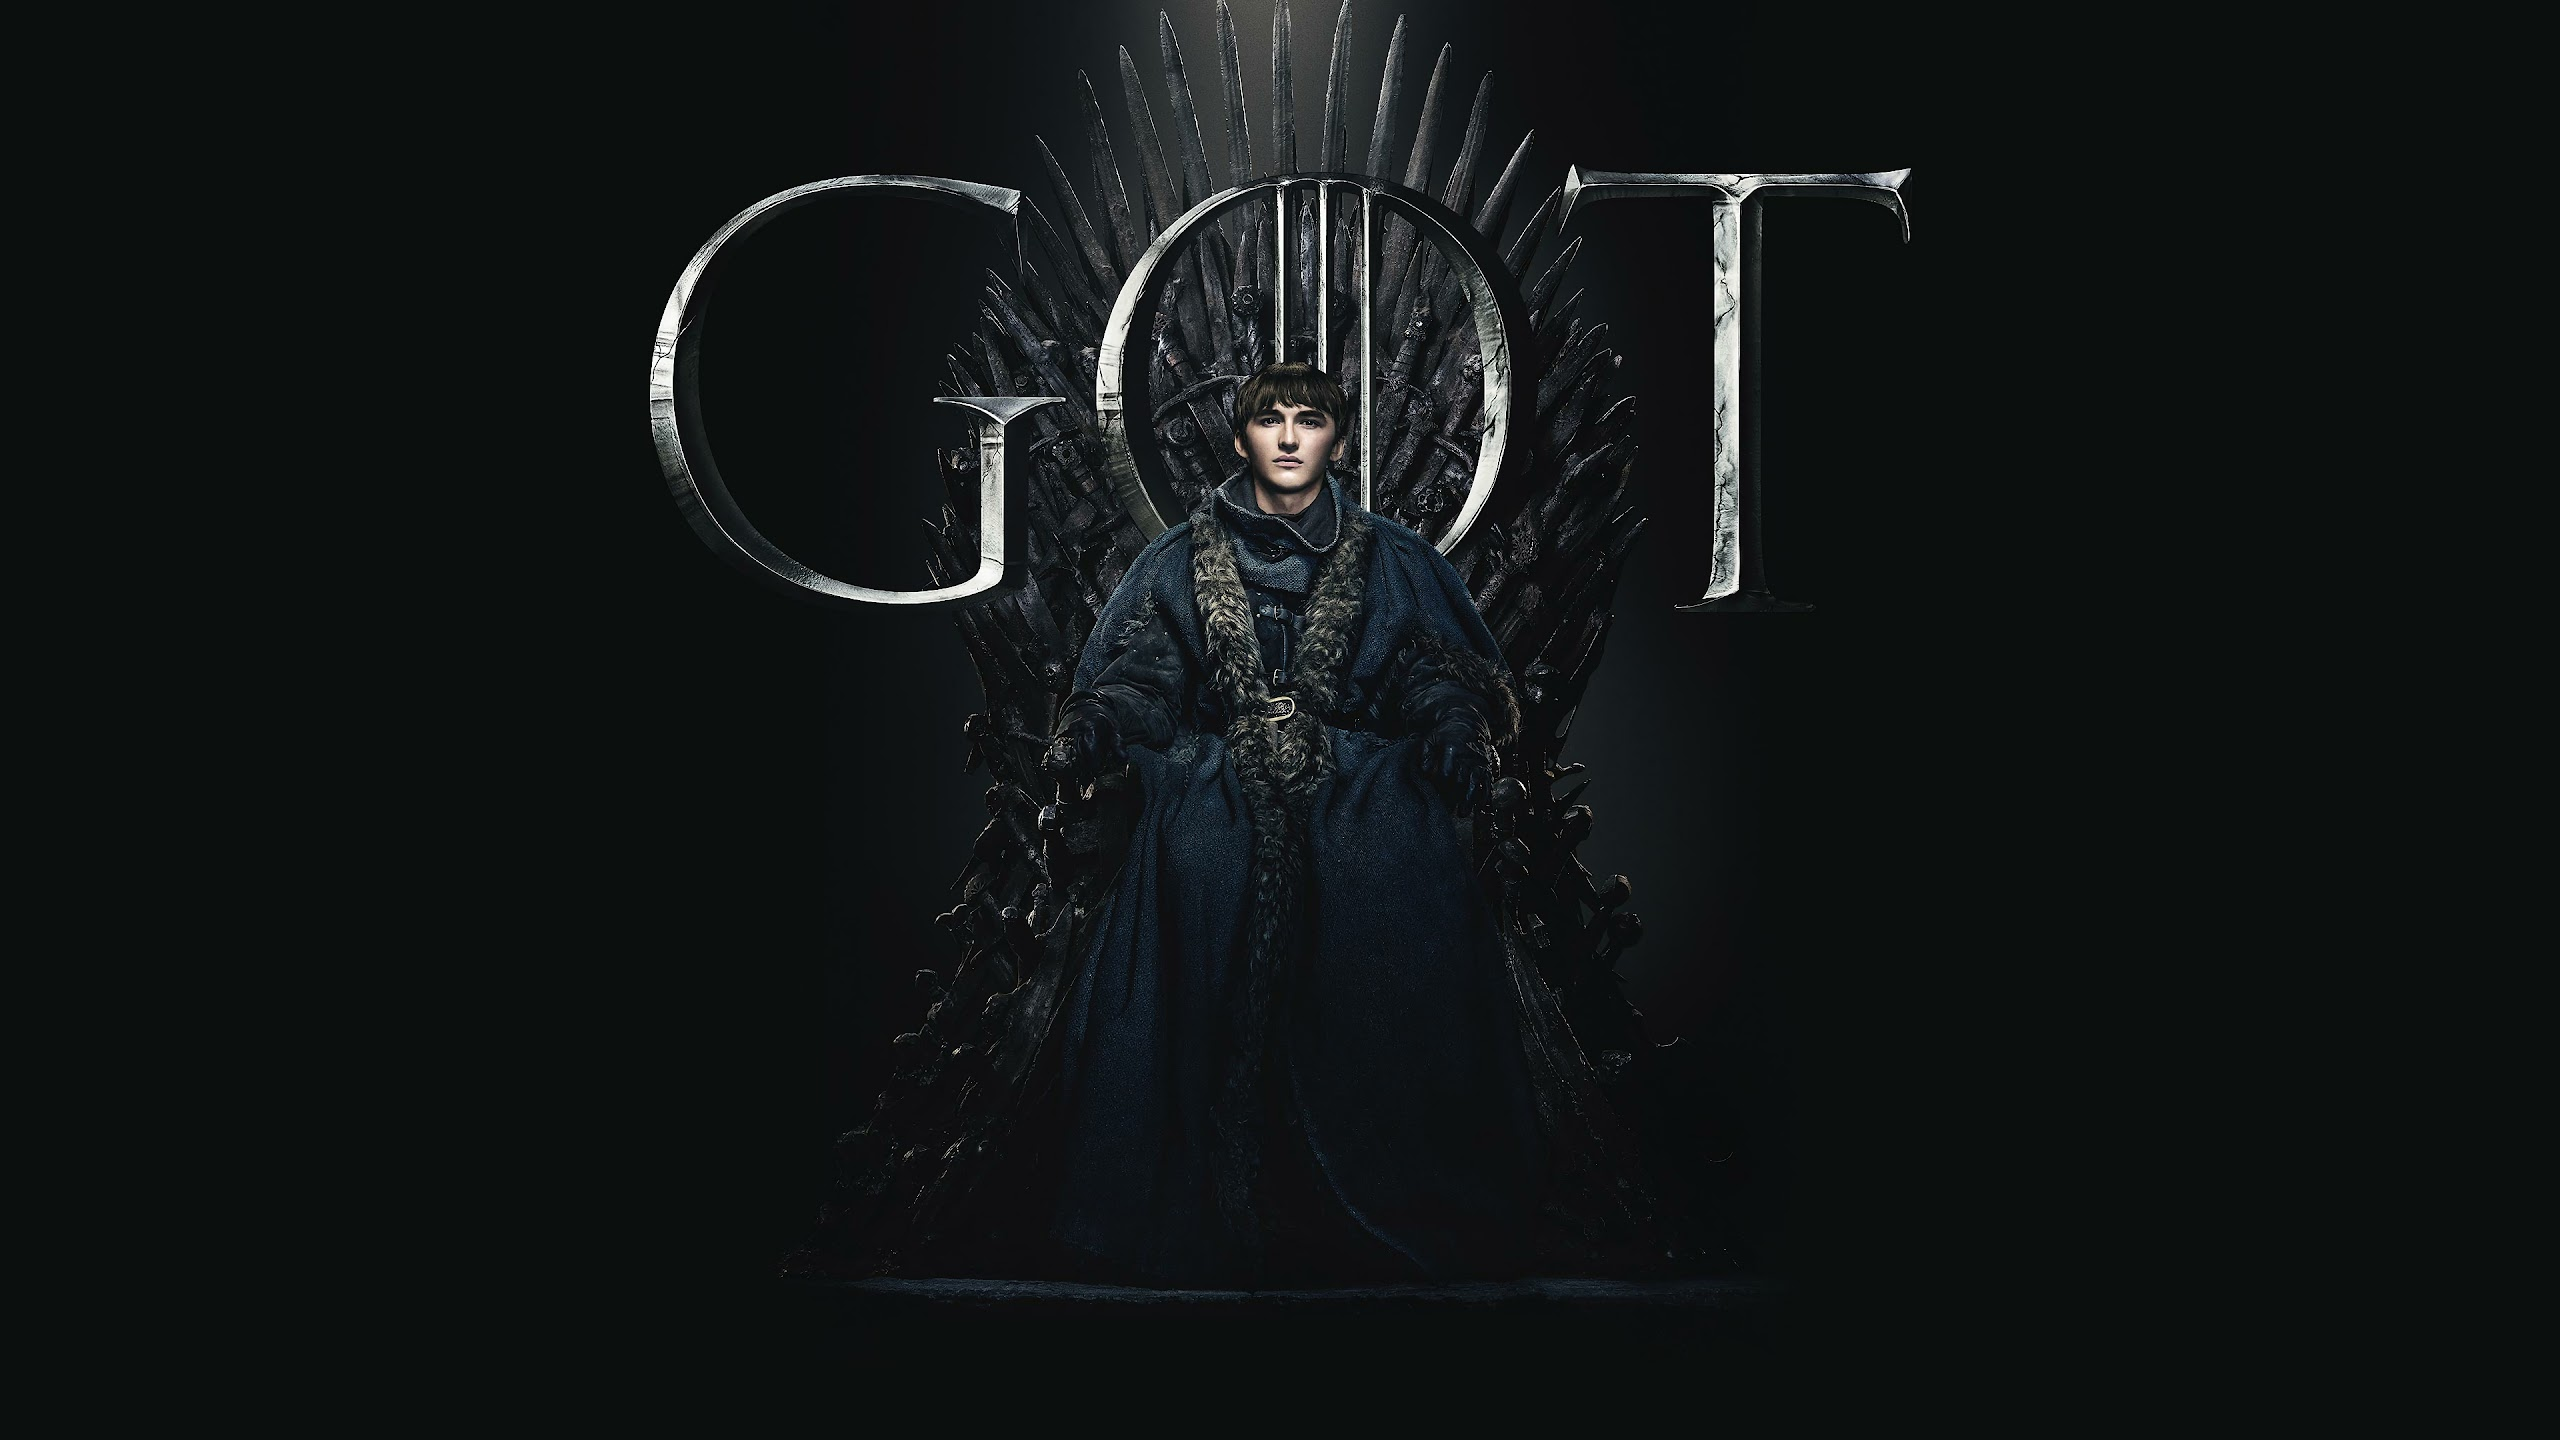 Bran Stark Game Of Thrones Season 8 4k Wallpaper 21